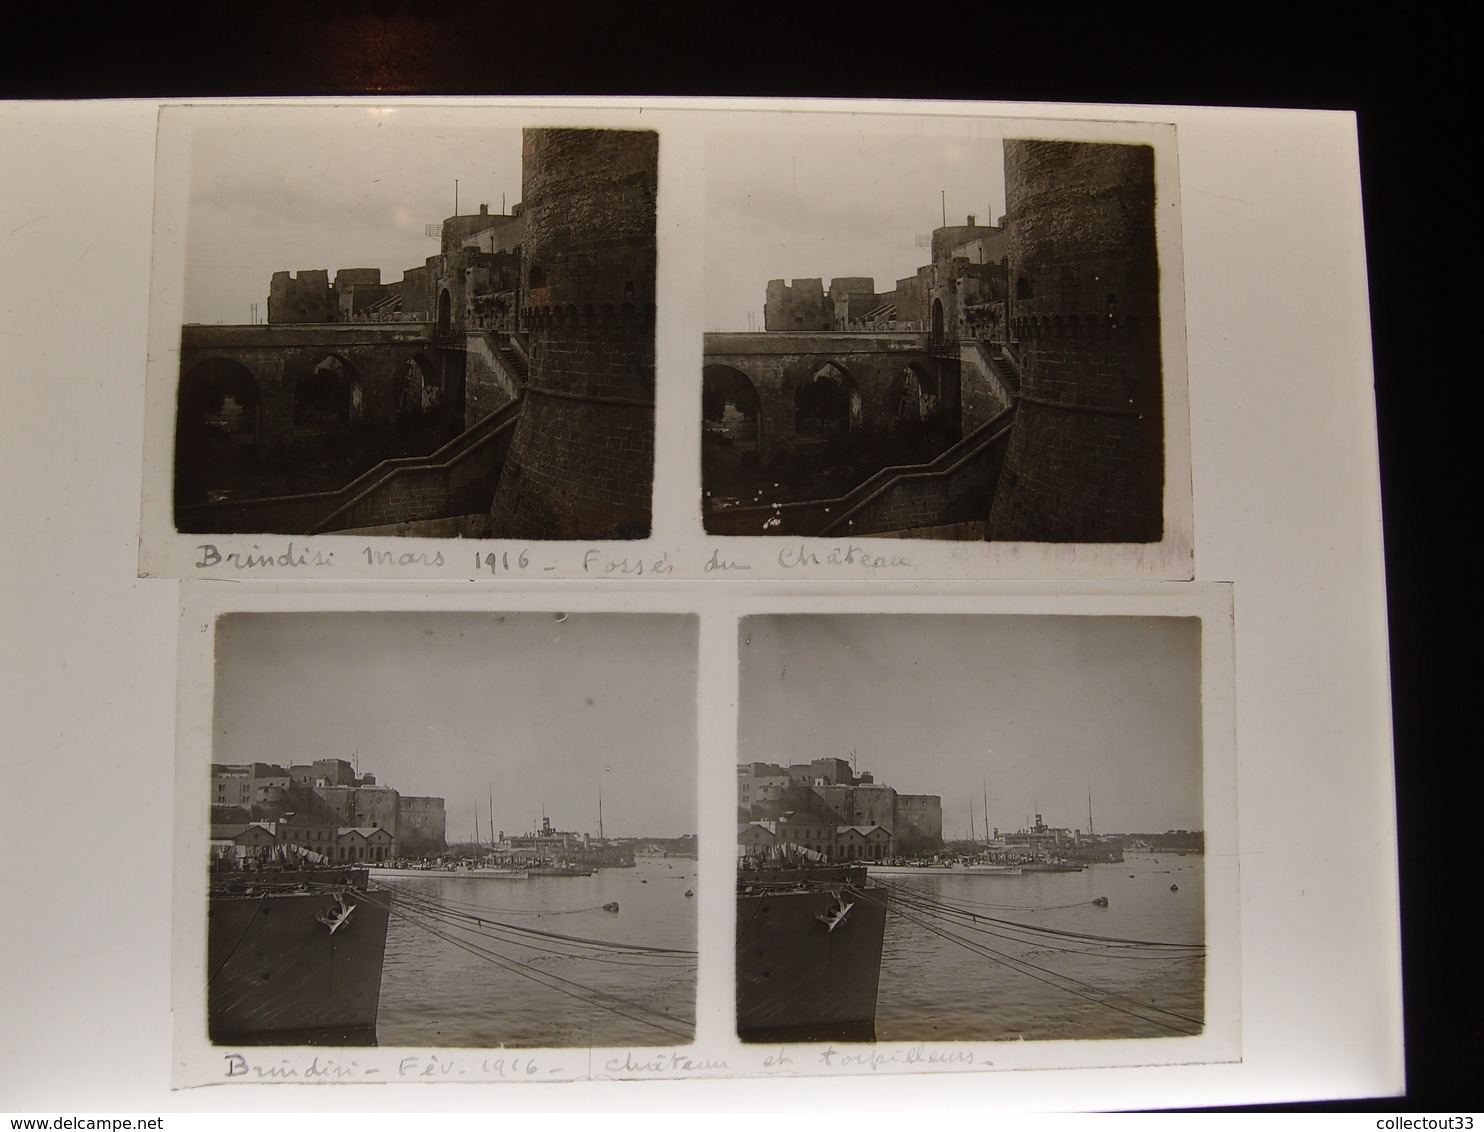 2 Plaques De Verre Stéréoscopiques Italie Brindisi 1916  Chateau Et Torpilleurs Marine Nationale - Diapositiva Su Vetro